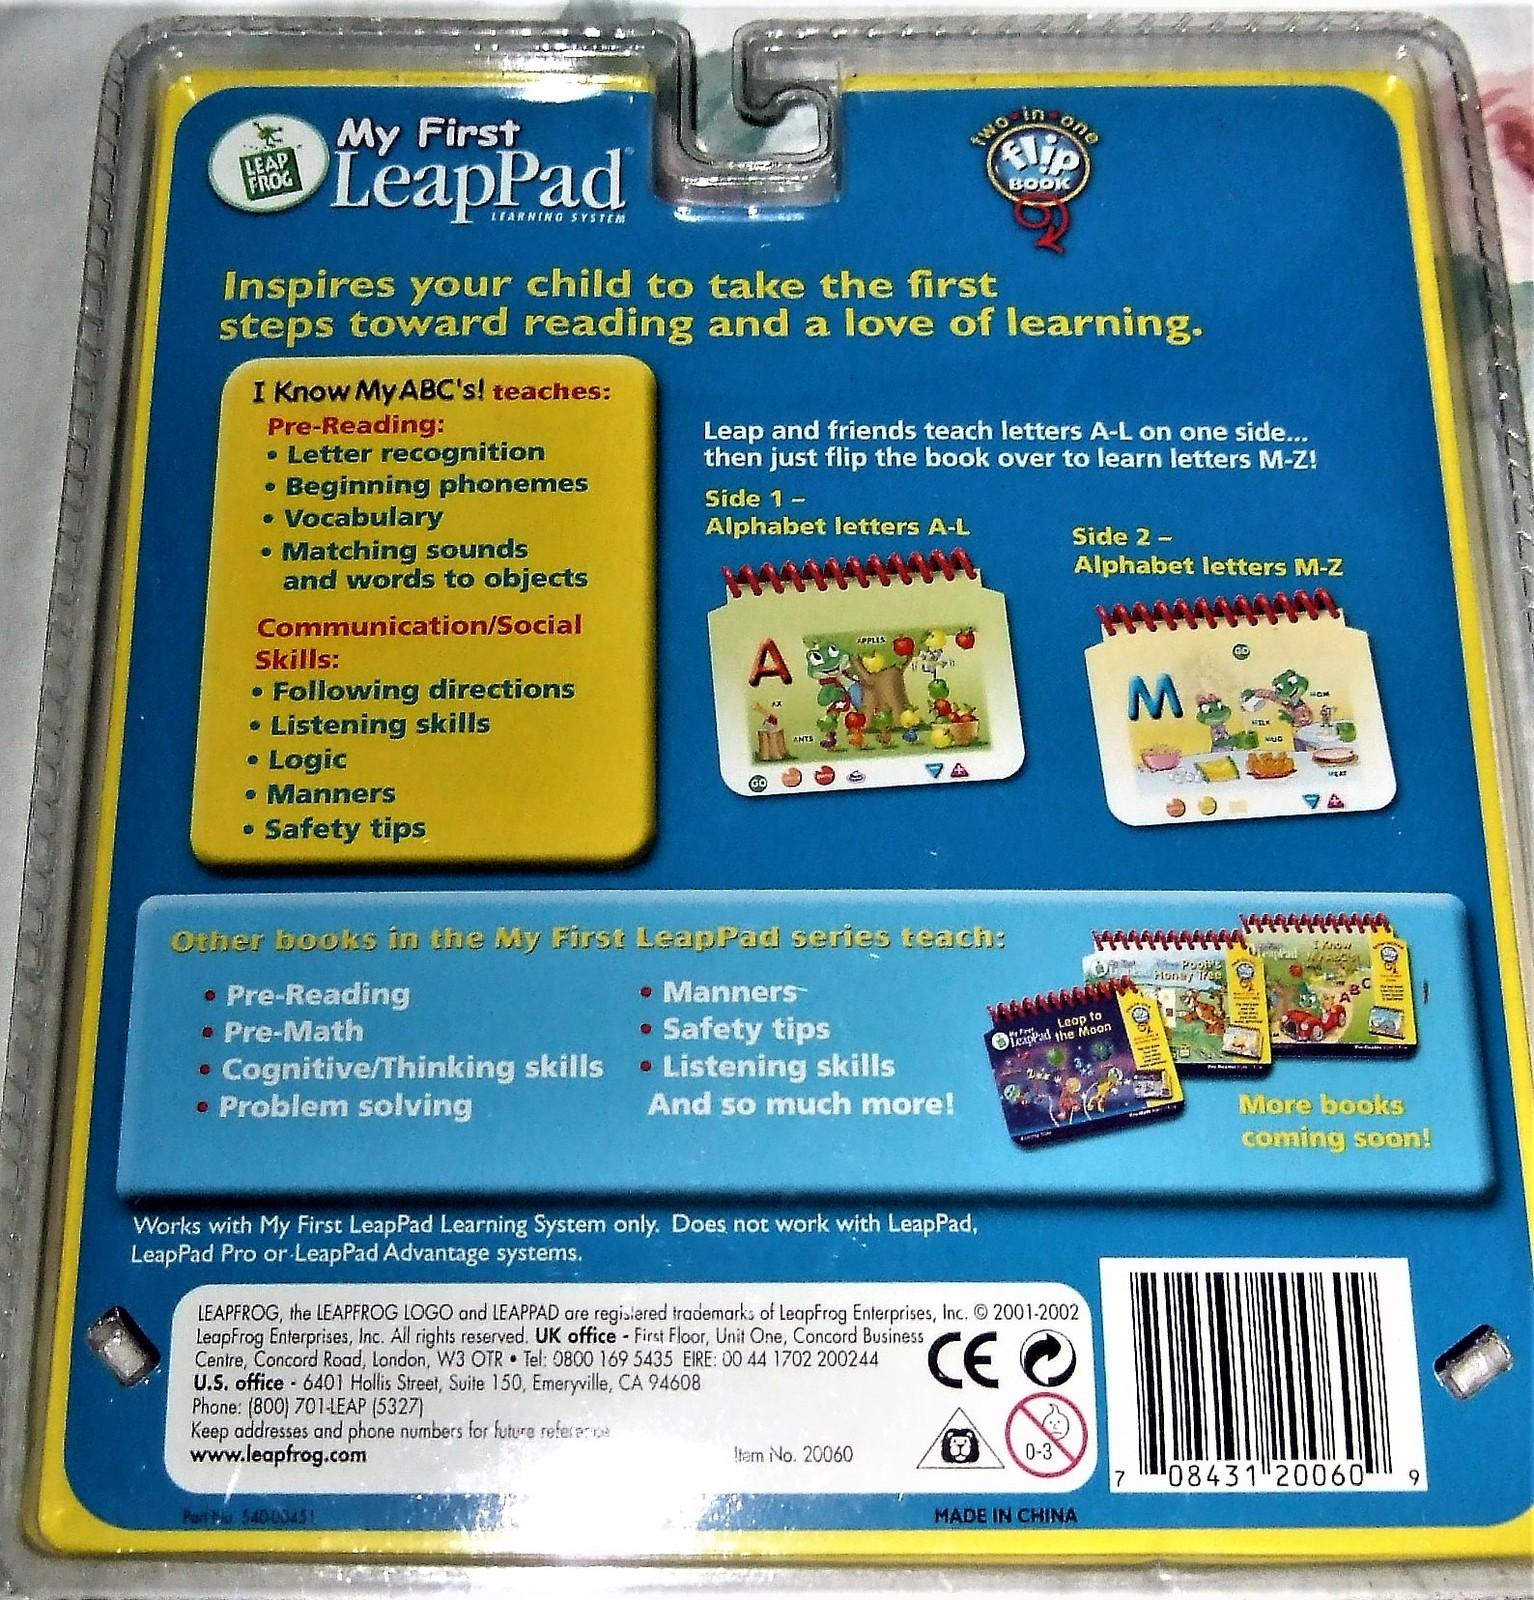 LeapPad - I Know my ABC's